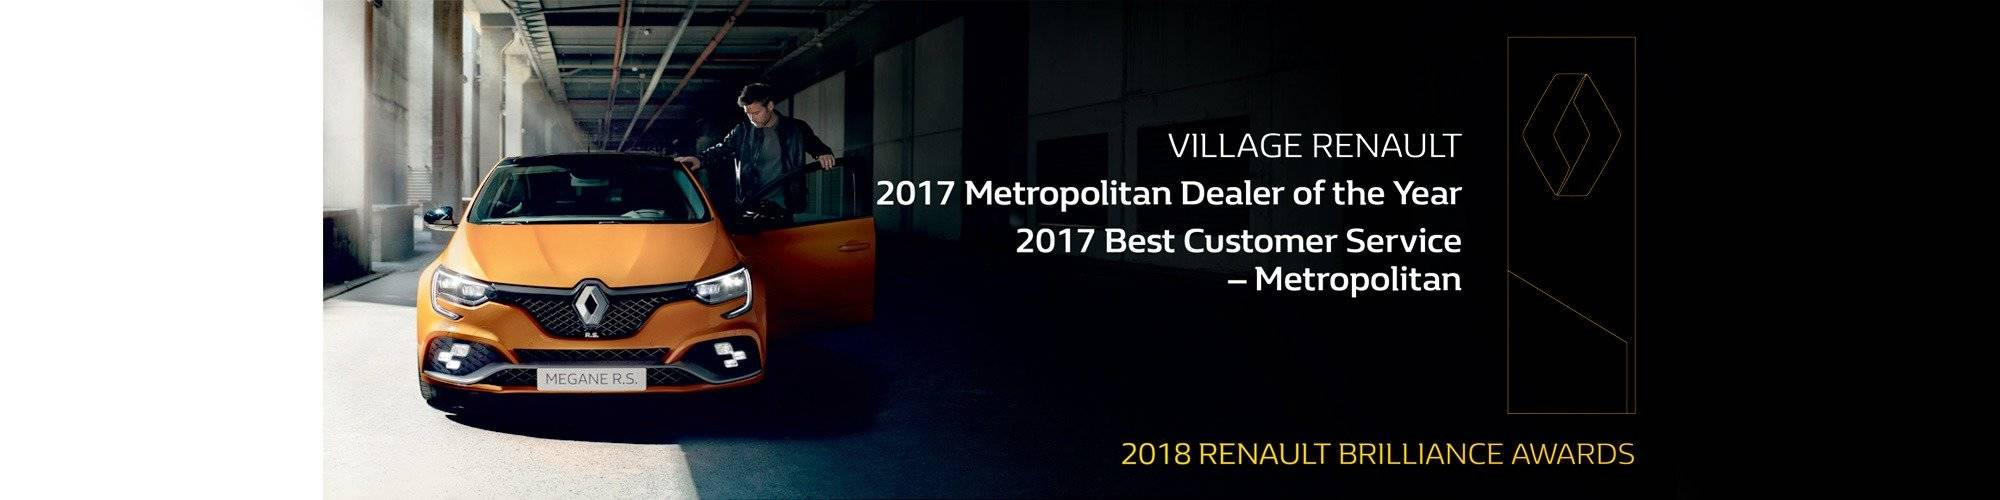 Village-Renault-Metro-Dealer-of-the-year-2017